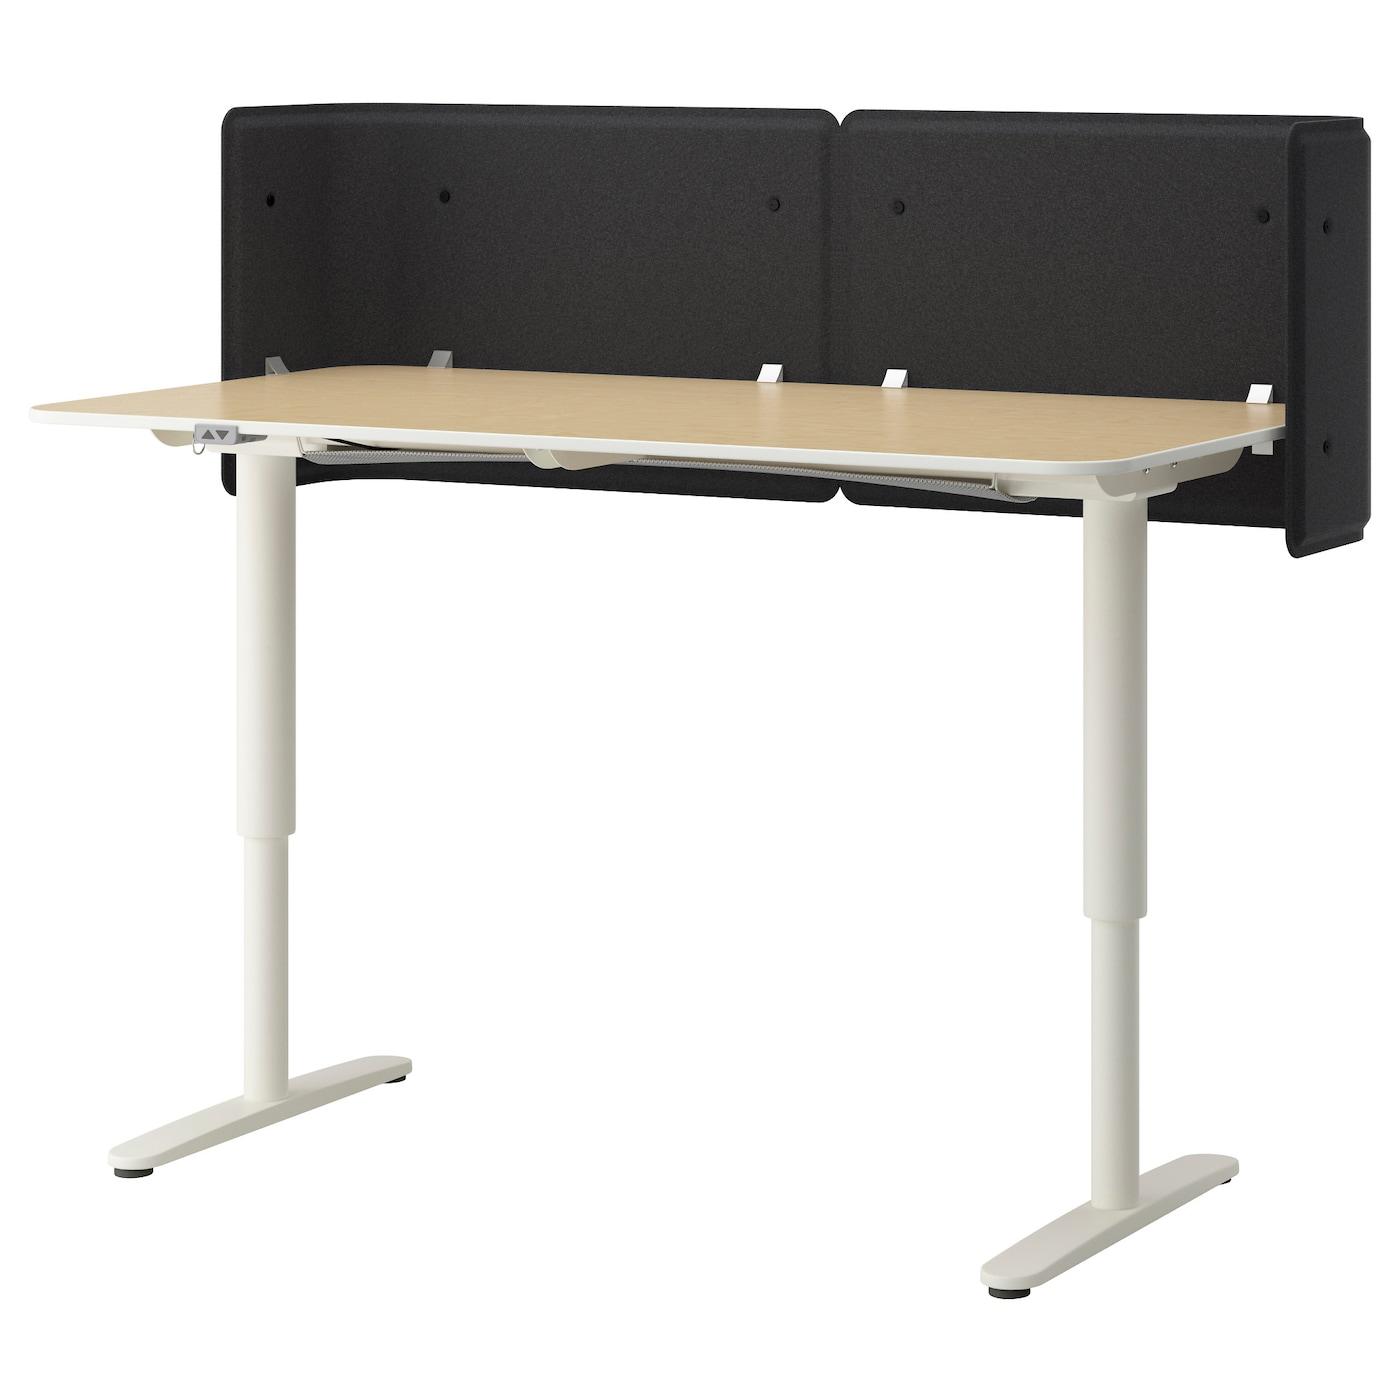 Ikea bureau debout knotten bureau debout ikea bekant for Stockage ikea galant